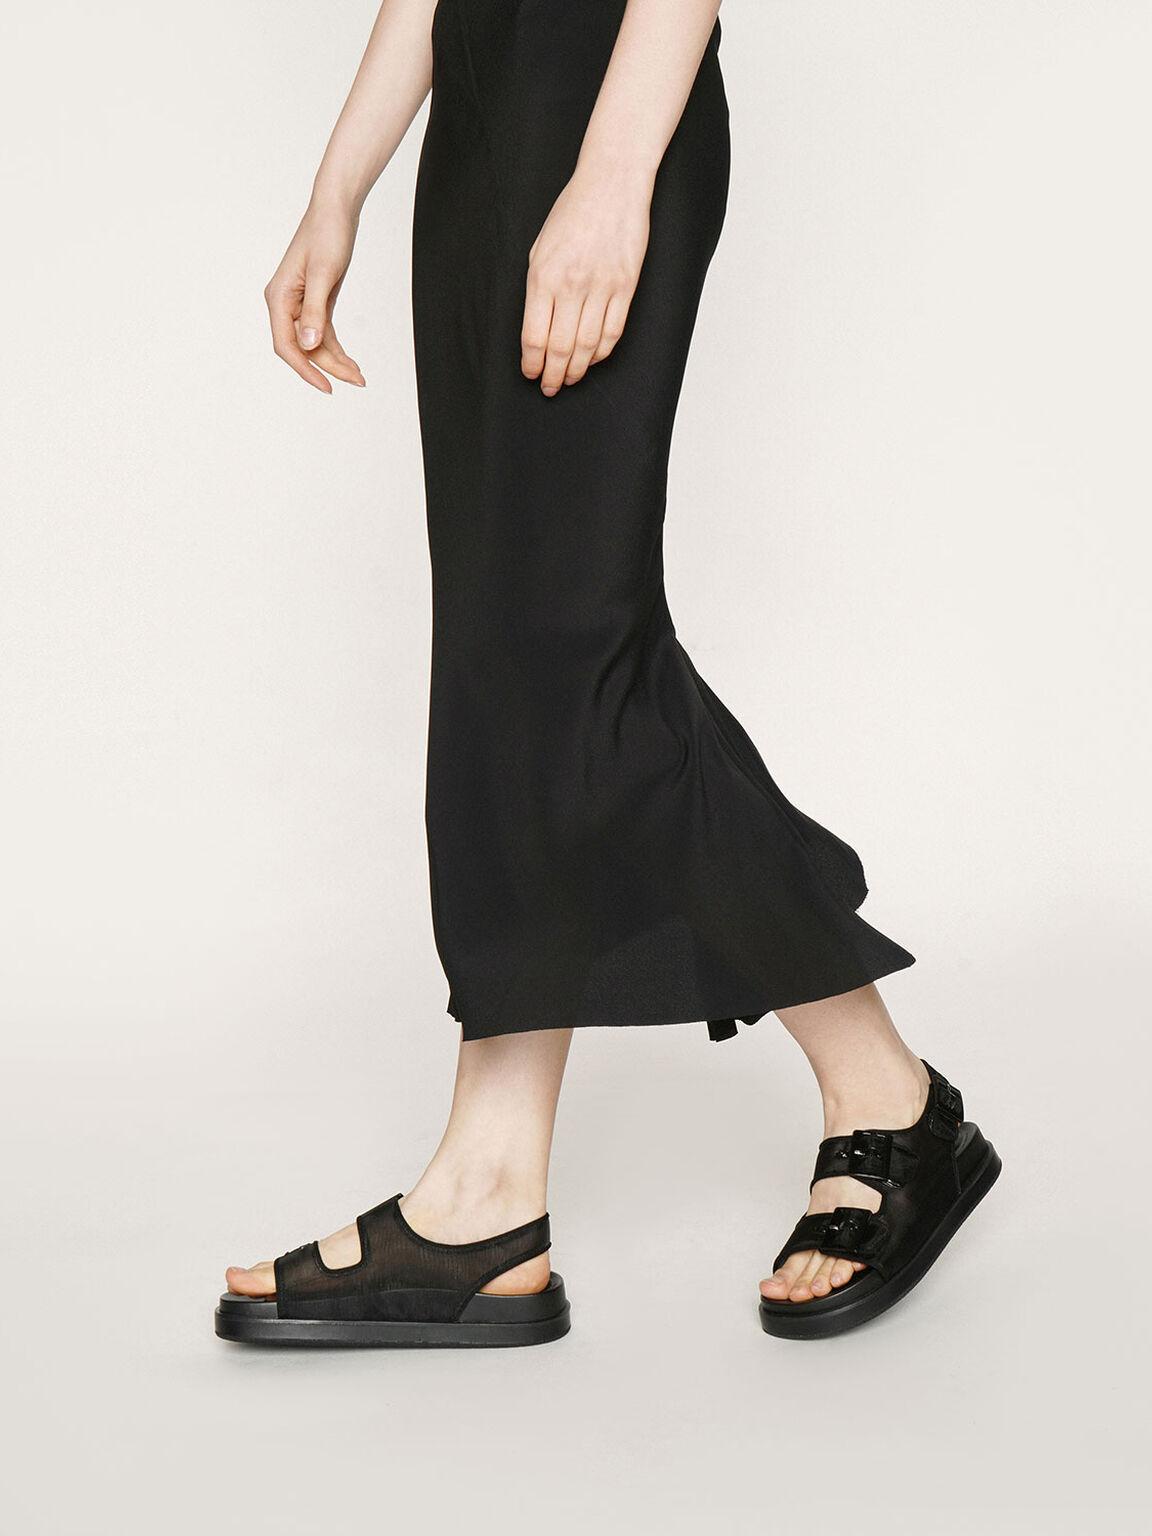 Mesh Flatform Sandals, Black, hi-res